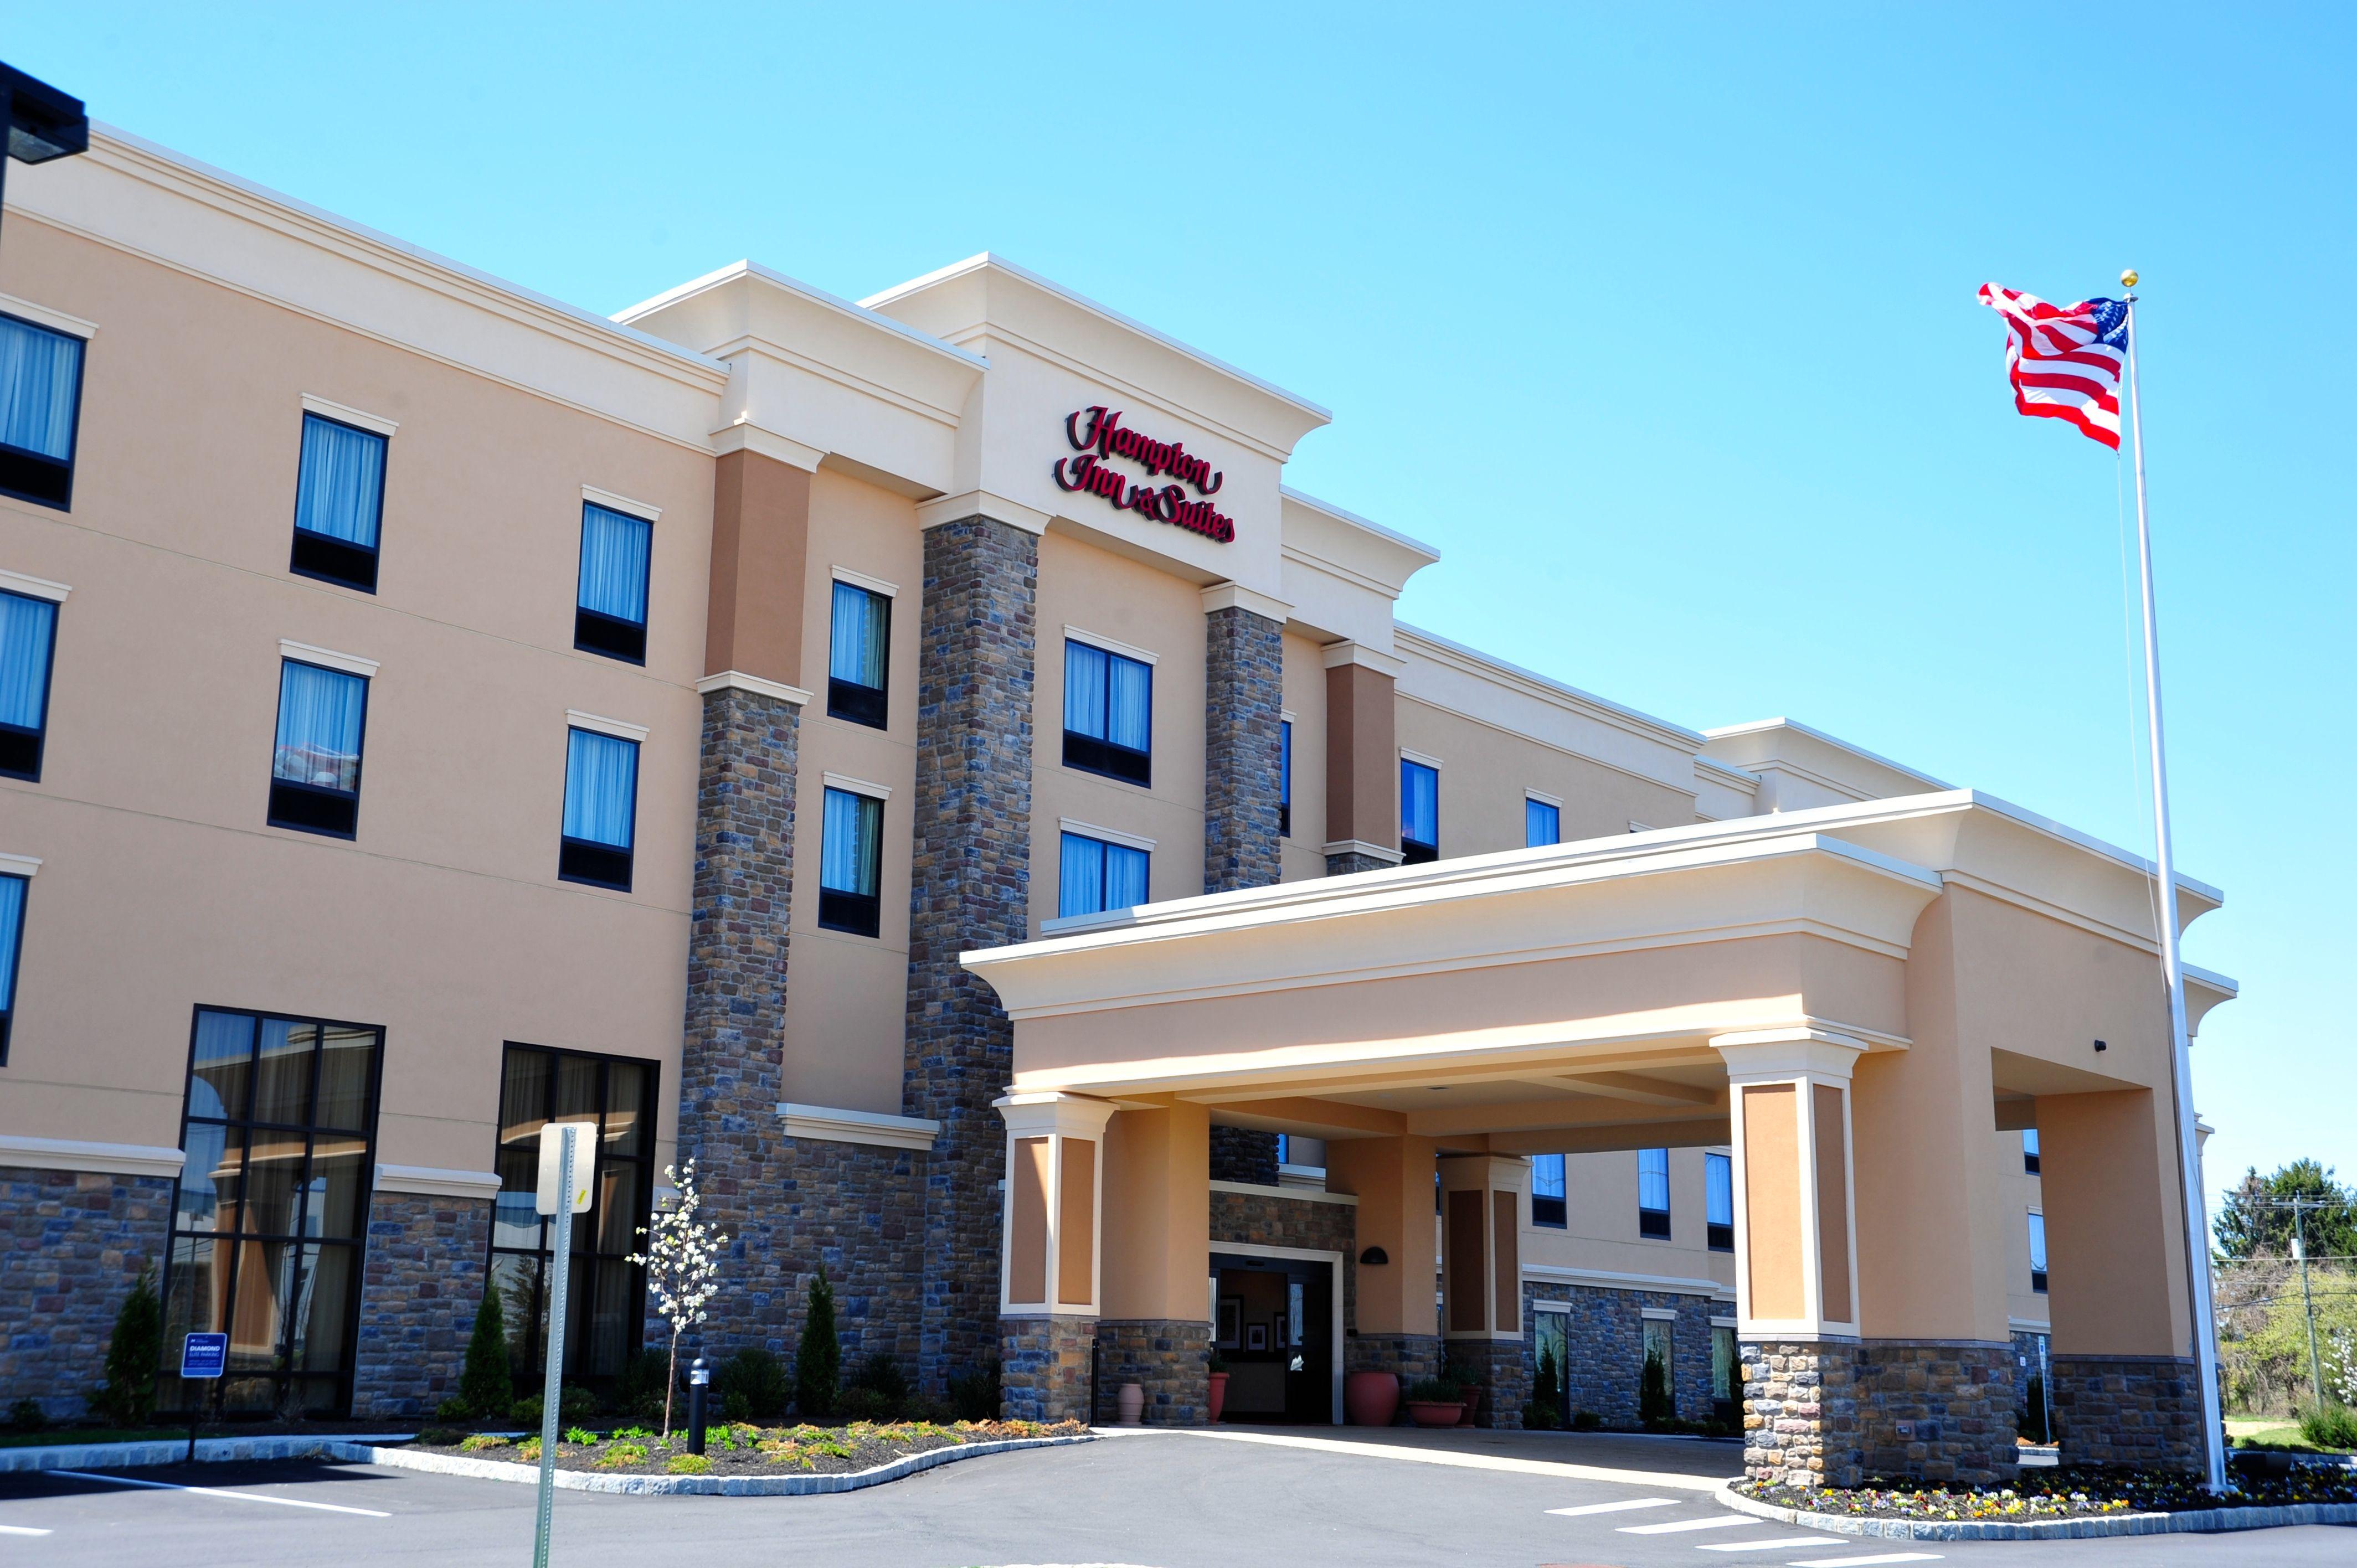 The Hampton Inn Suites Robbinsville Nj